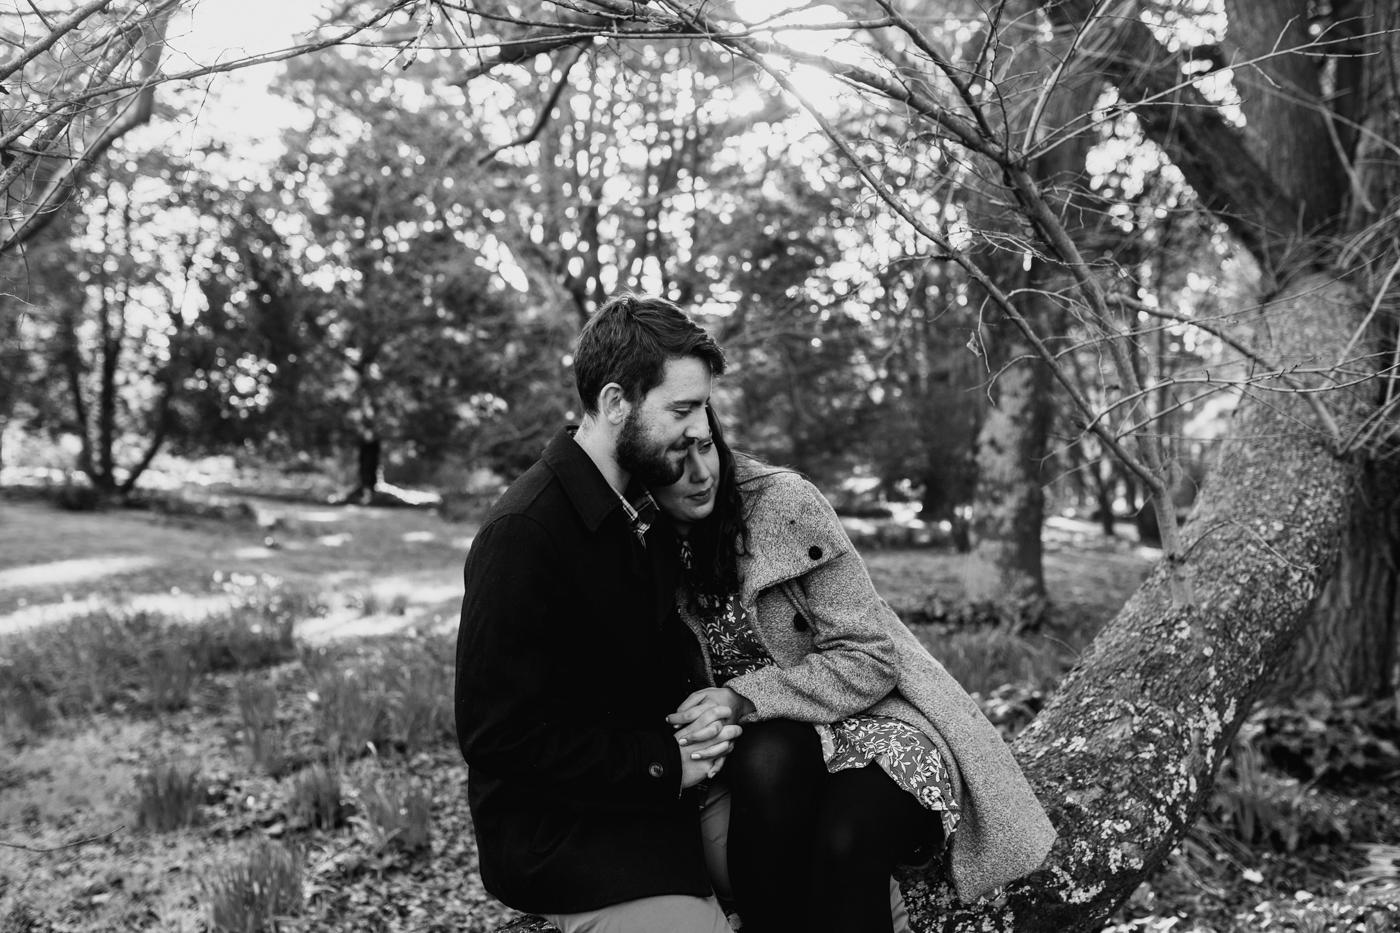 Kate & Kieran - Southern Highlands Engagement - Samantha Heather Photography-16.jpg